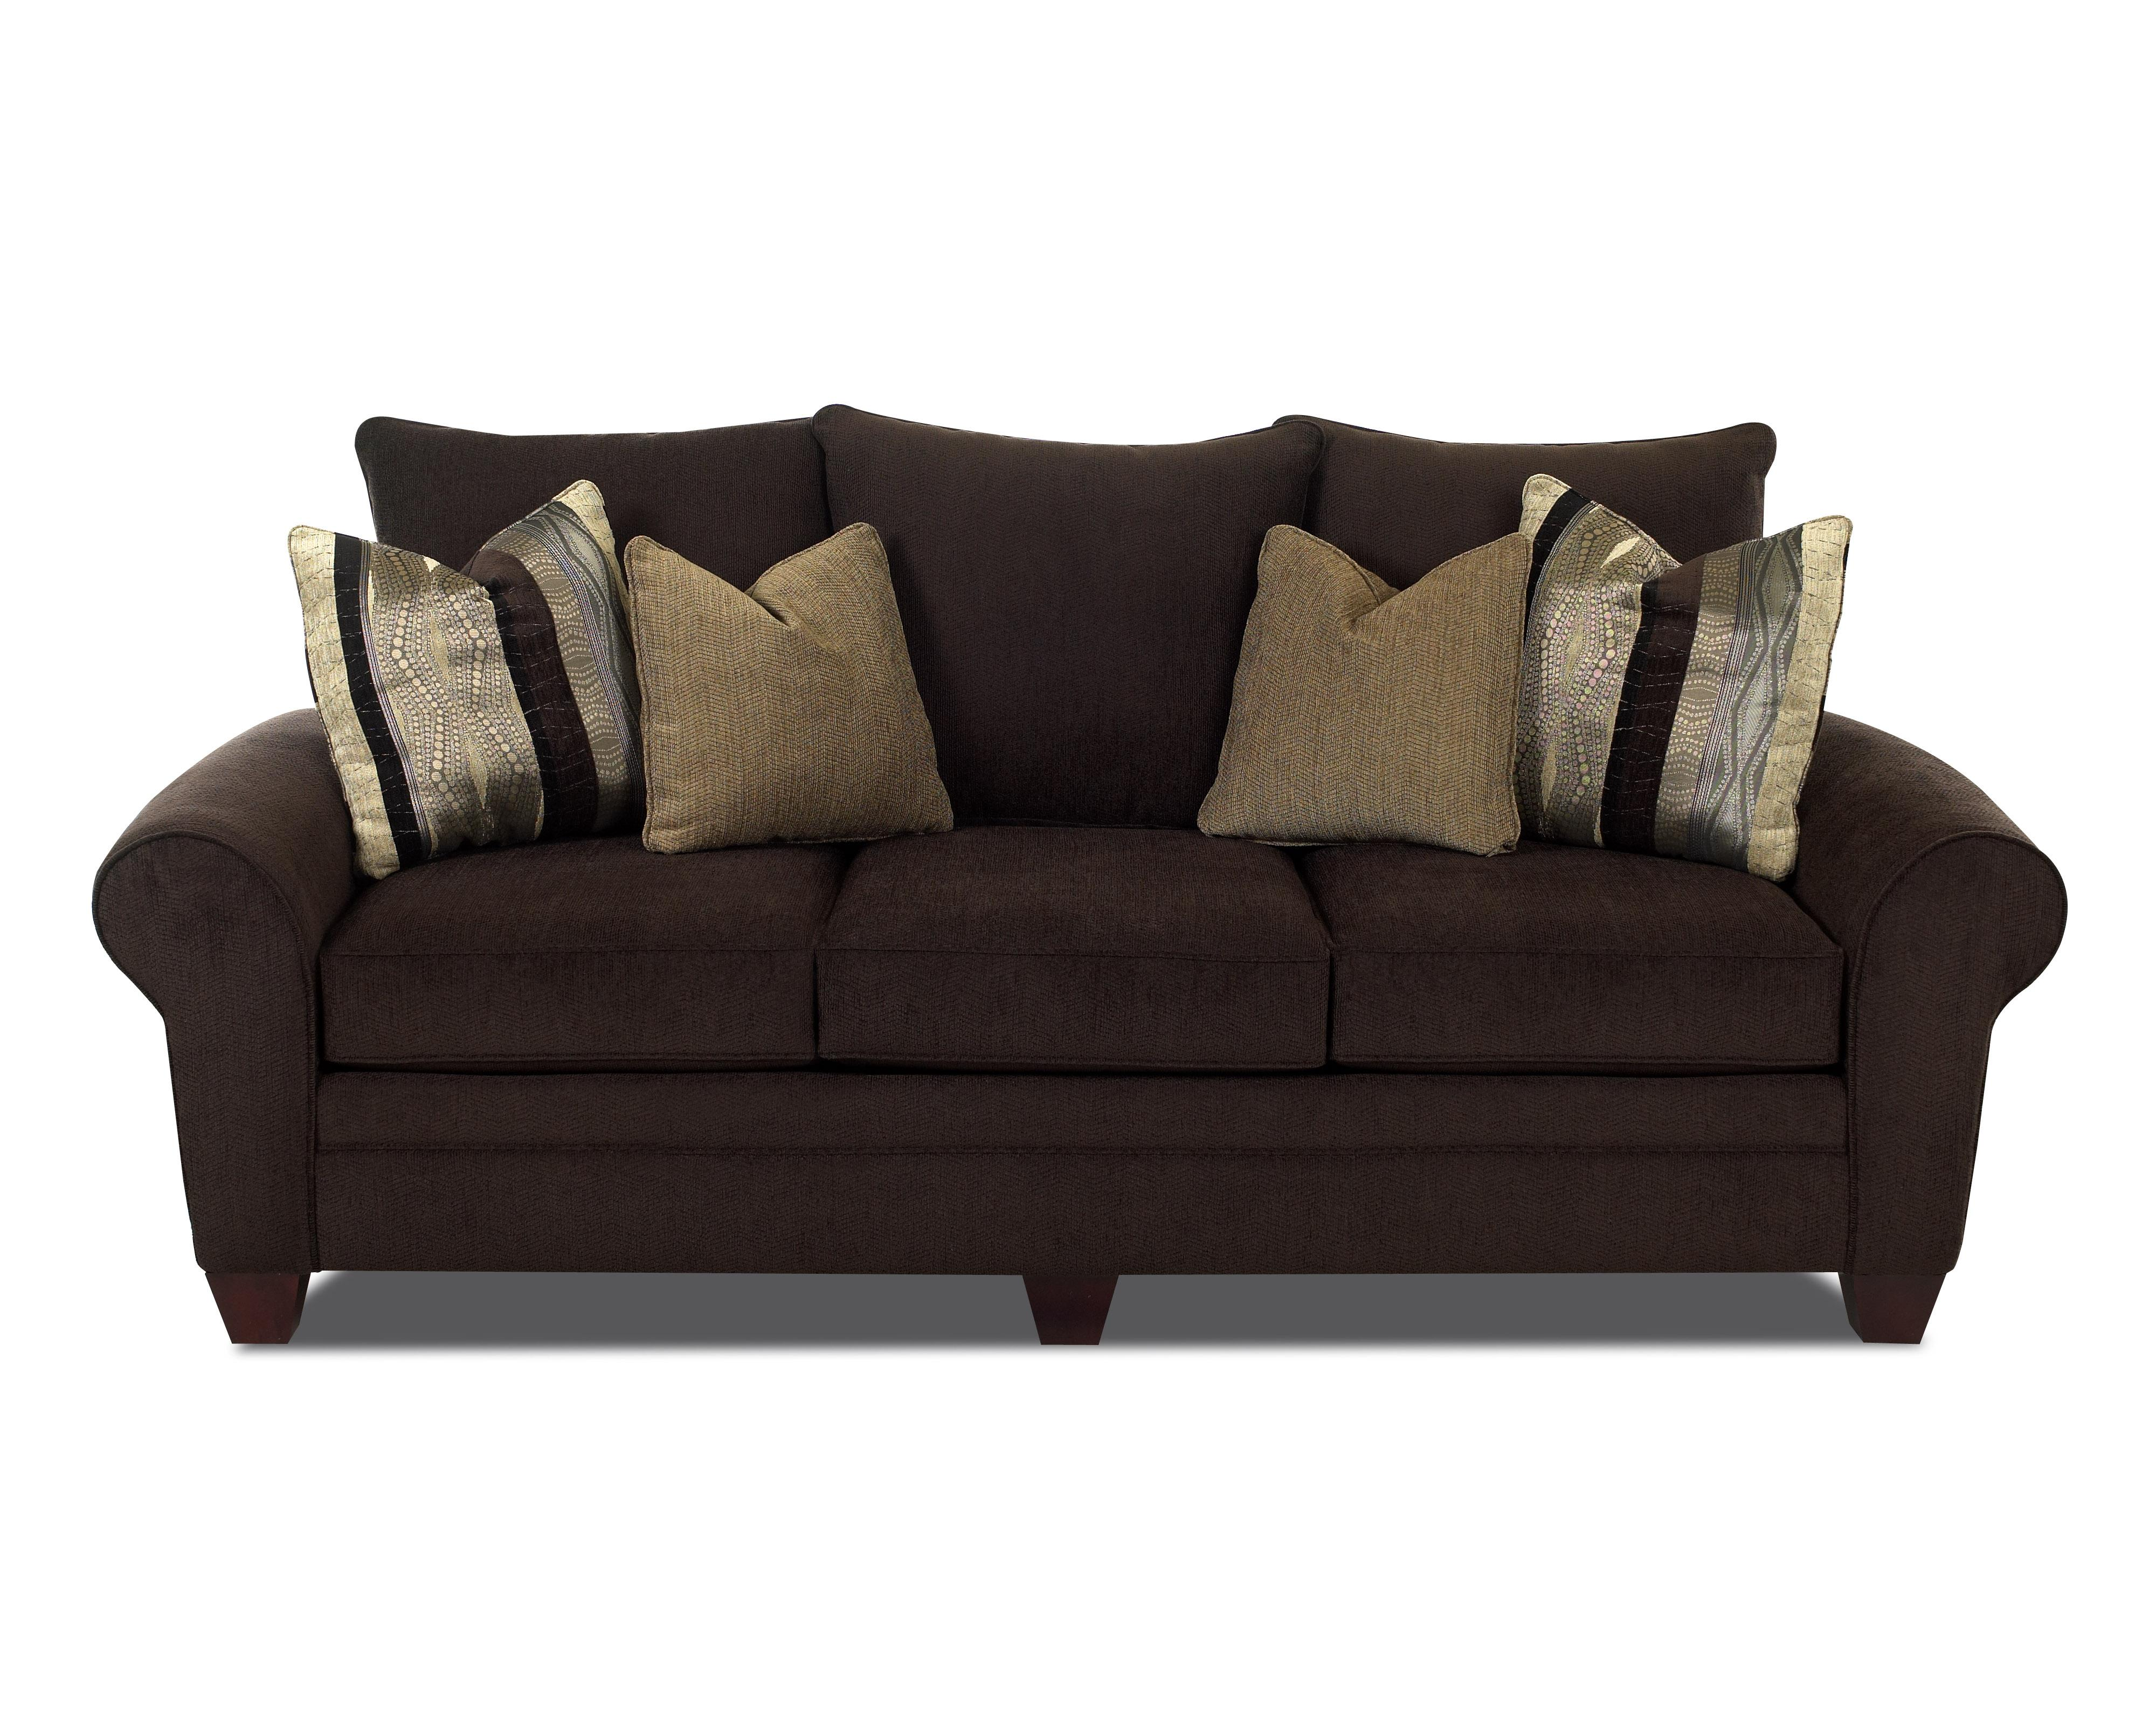 Klaussner Kazler Contemporary Stationary Sofa - Item Number: K57000S